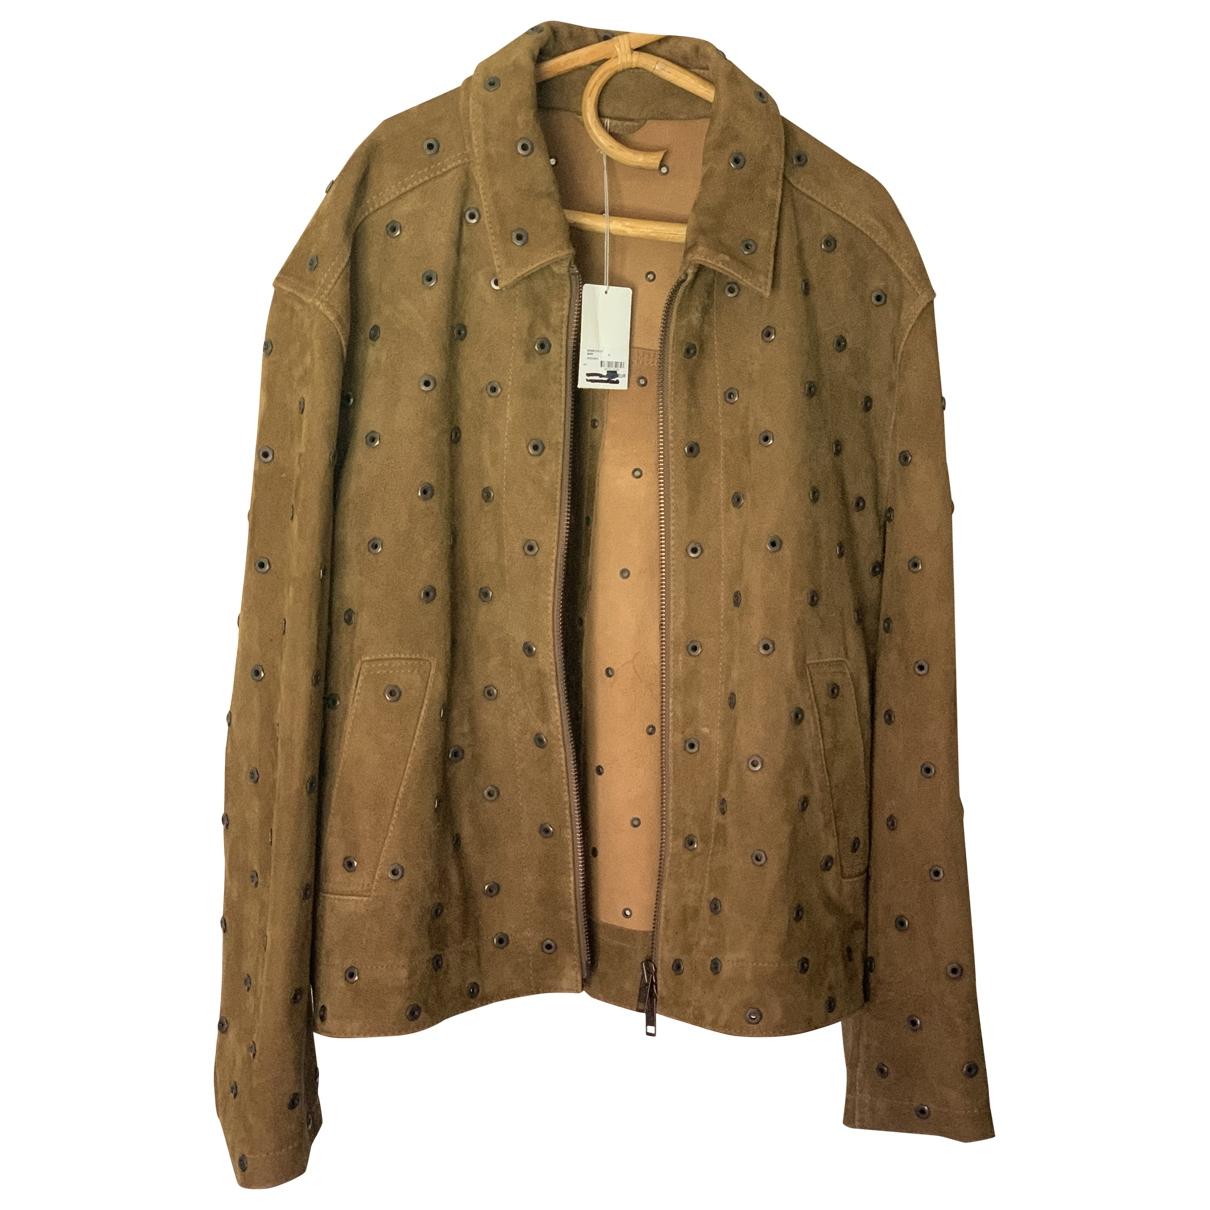 Zadig & Voltaire \N Brown Suede jacket  for Men XL International